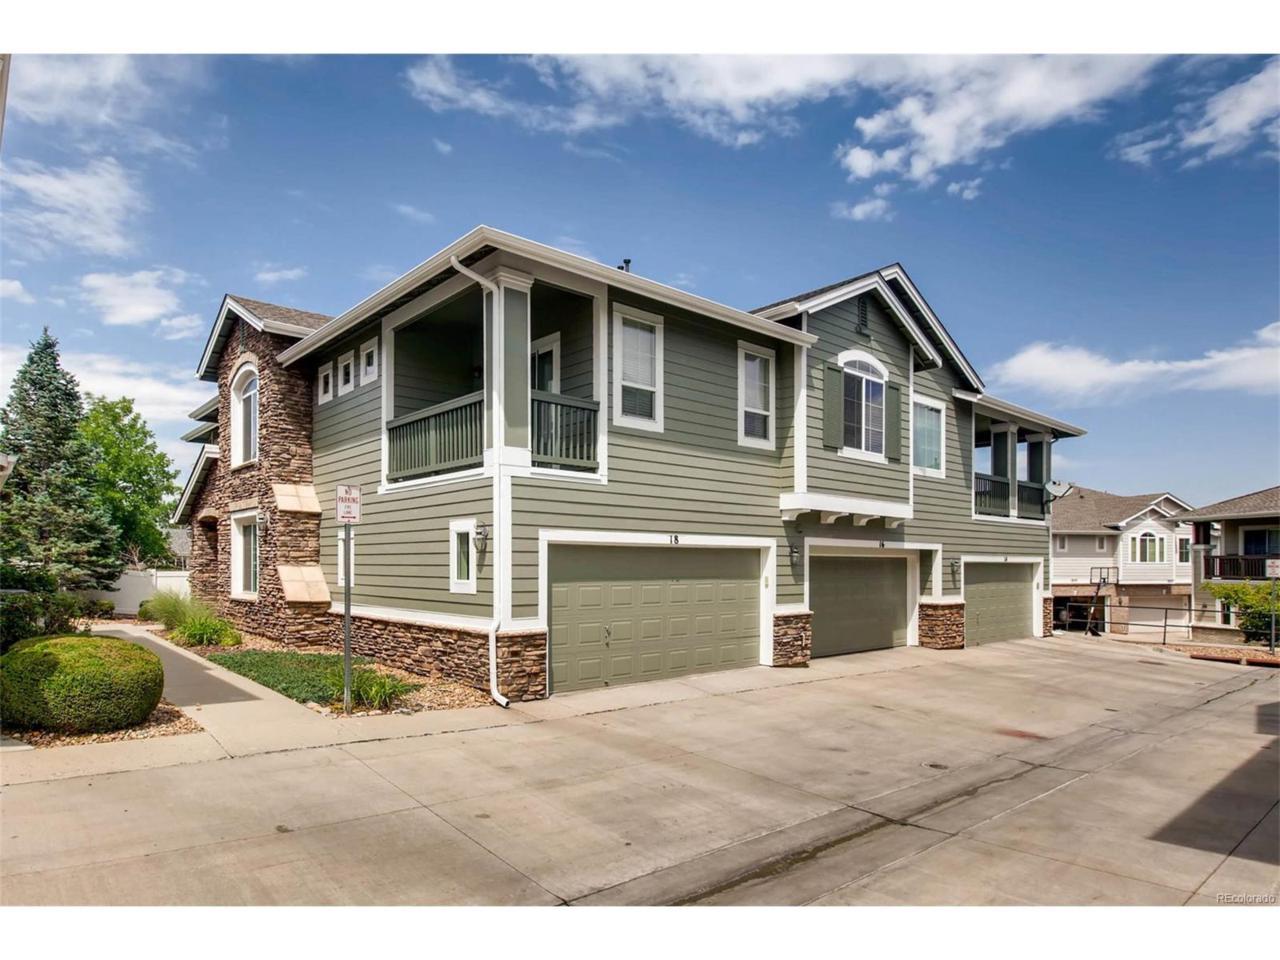 18 Whitehaven Circle, Highlands Ranch, CO 80129 (MLS #5646374) :: 8z Real Estate